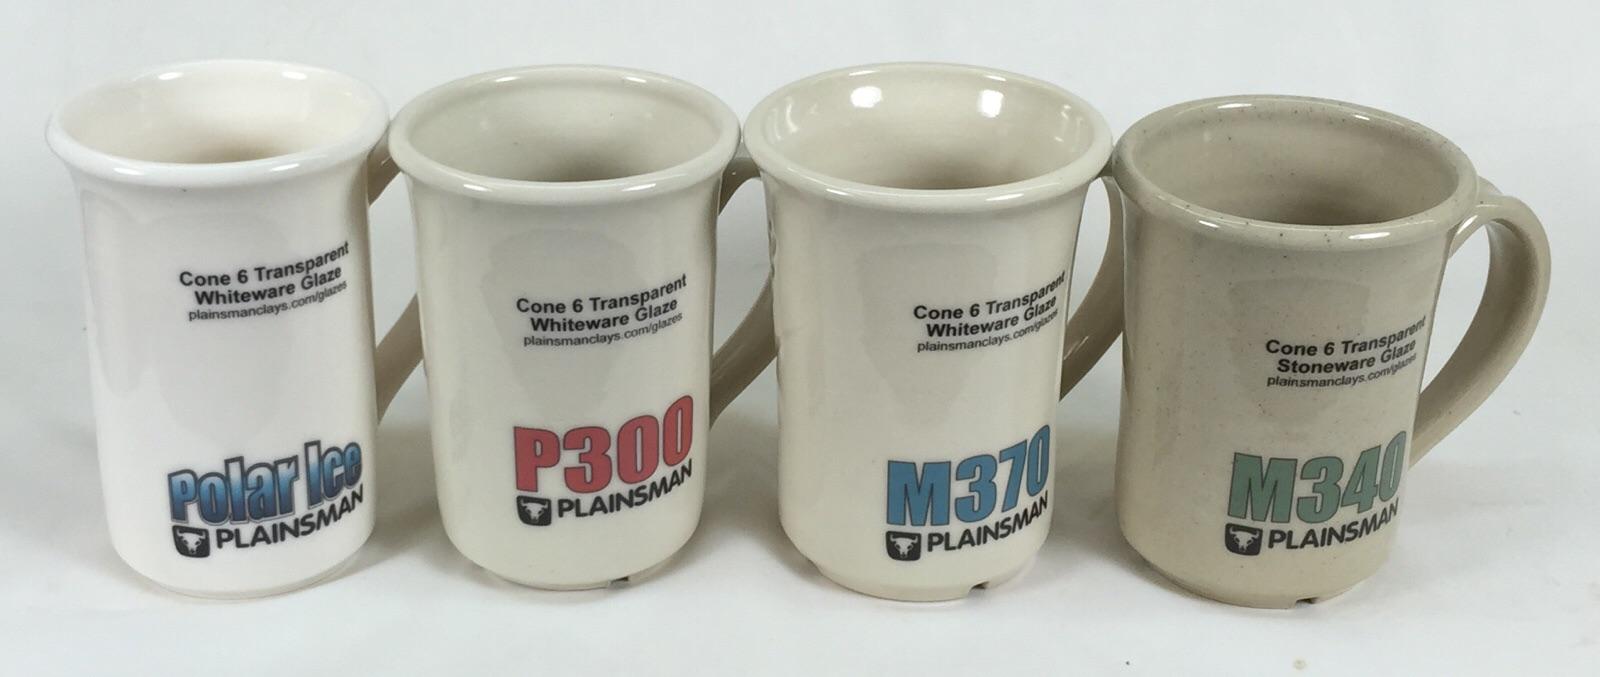 Plainsman Polar Ice P300 M370 And M340 With G2926b Whiteware Transpa Glaze On The Porcelain G2916f Stoneware